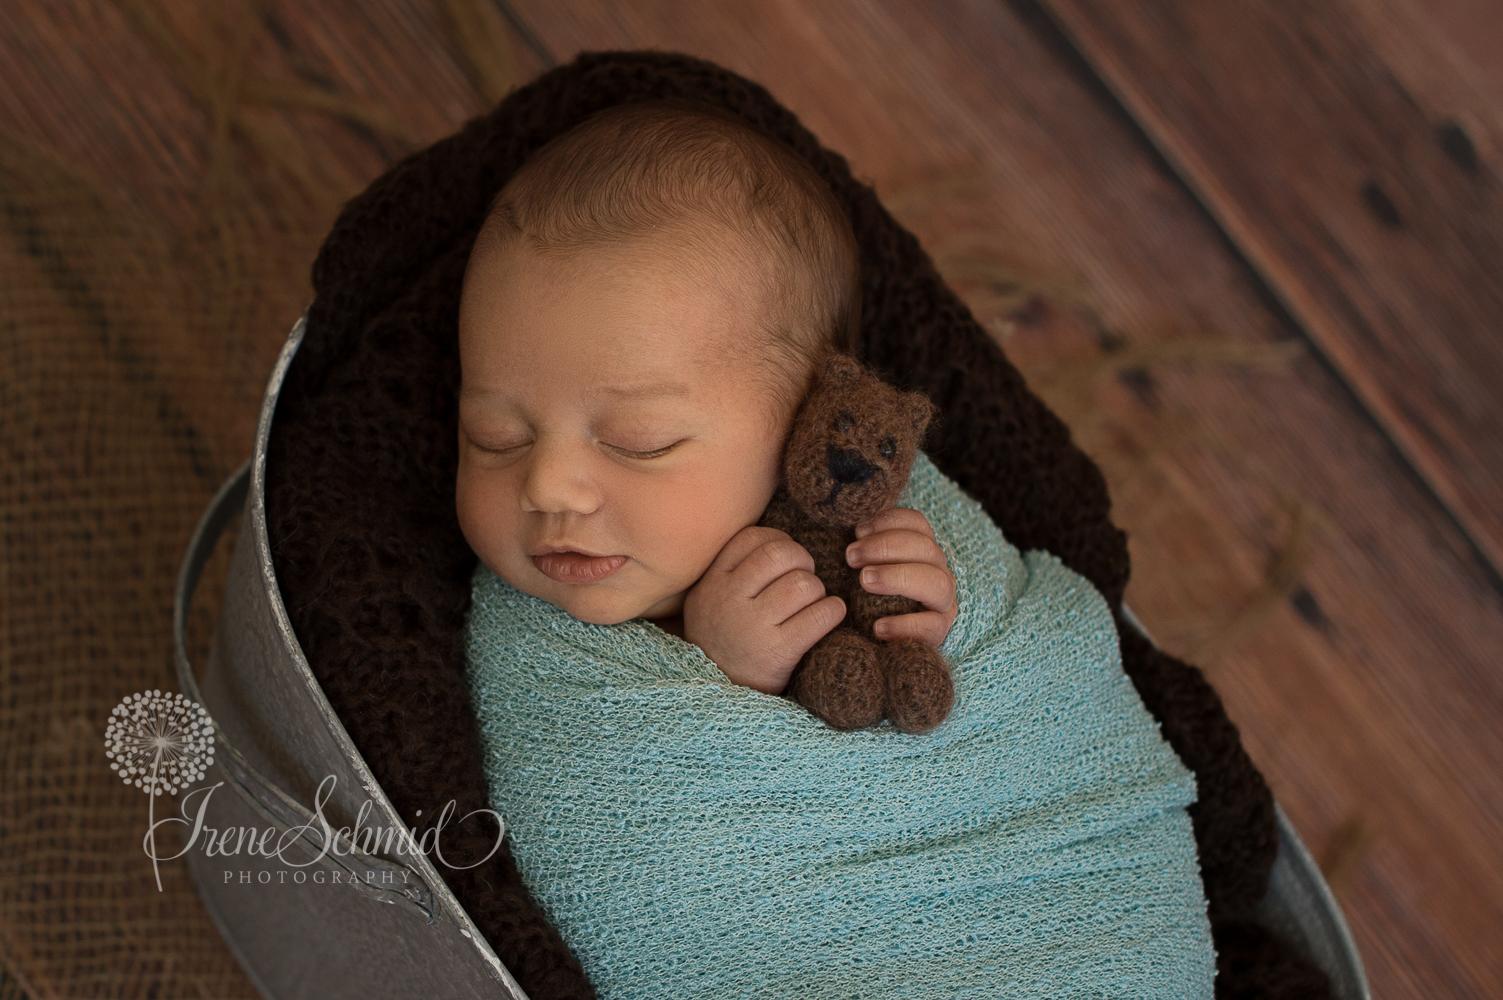 Alessandro - Neugeborenenbilder - Babyfotografin Irene Schmid